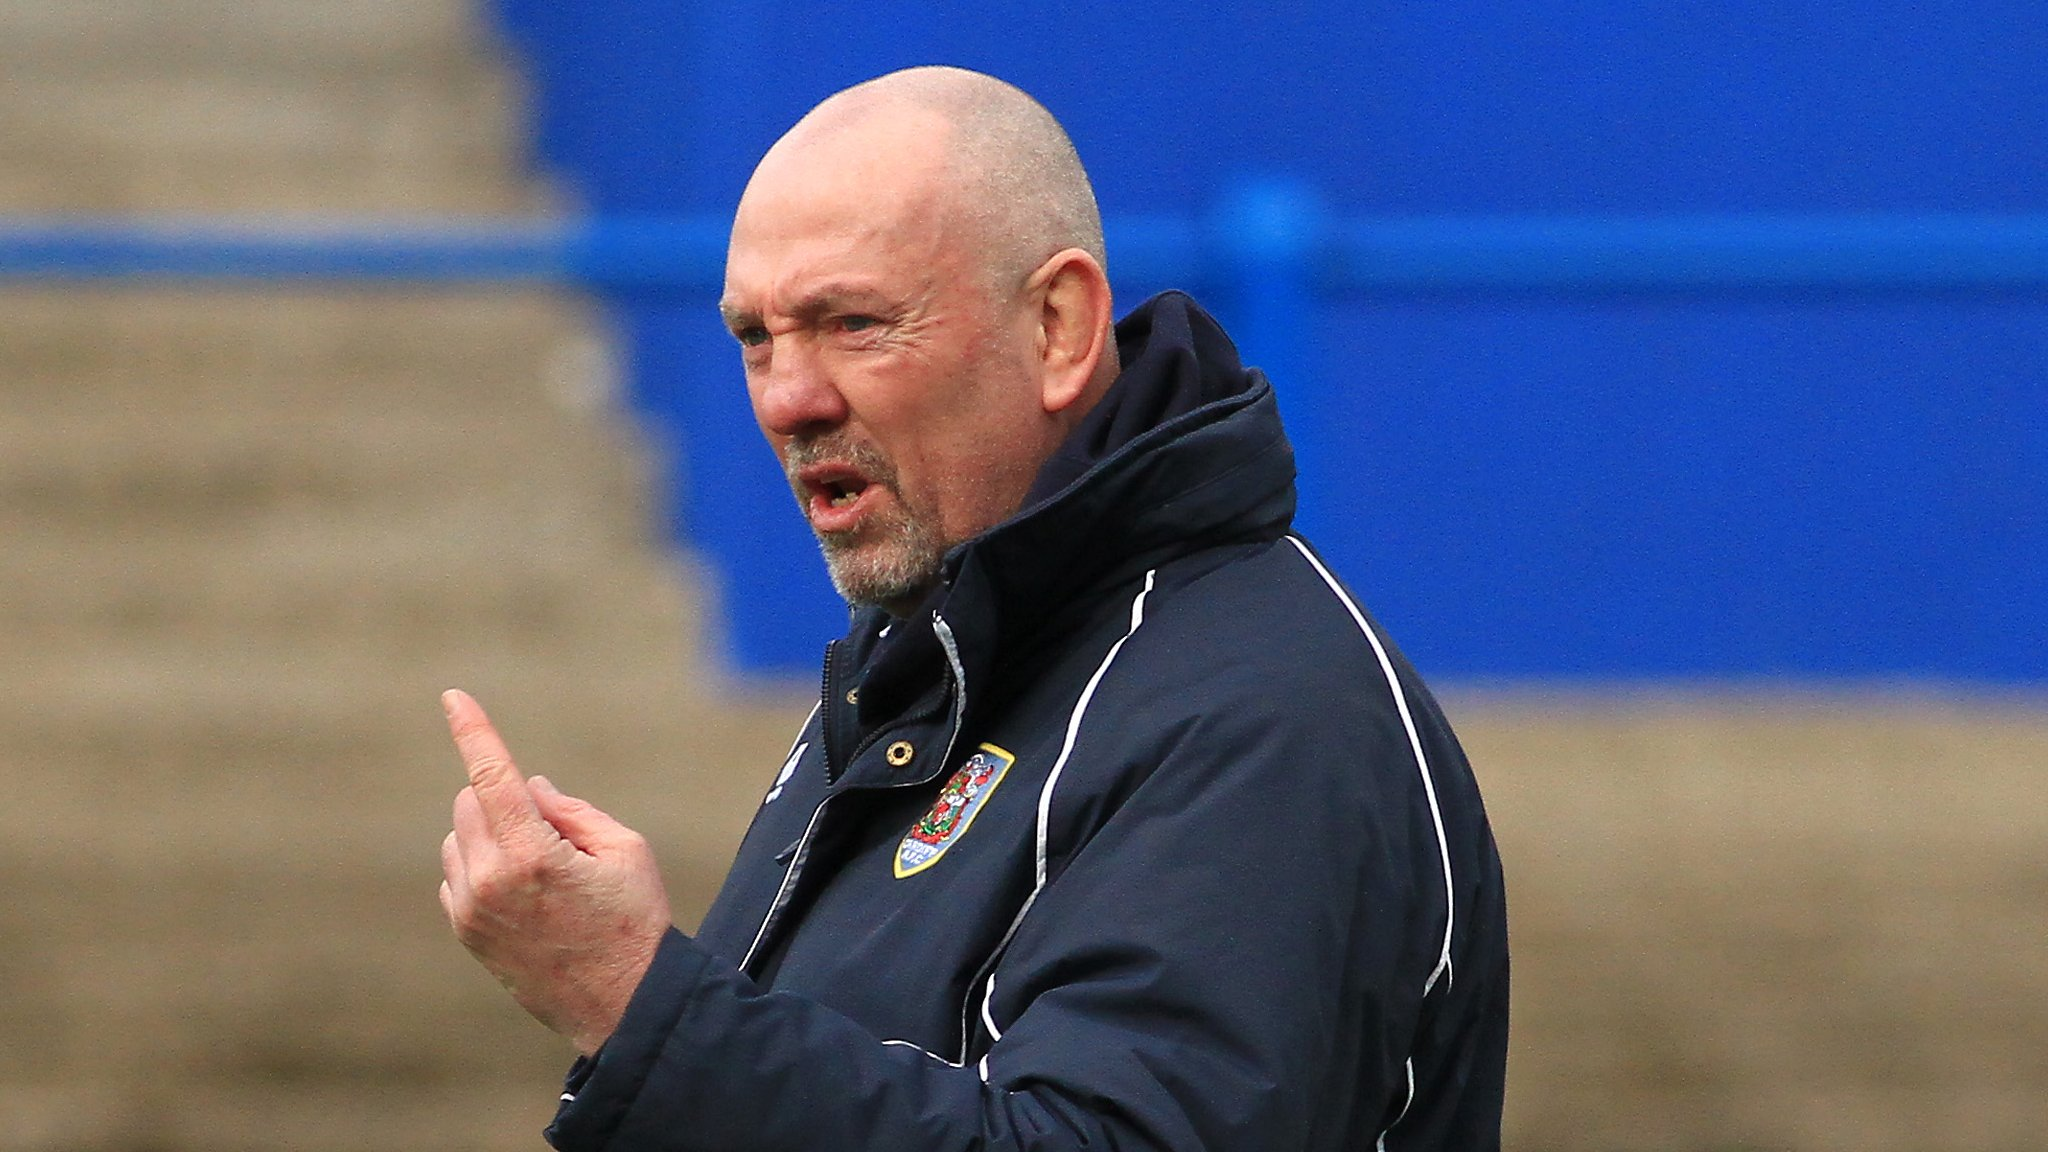 Neath RFC head coach Simon King and backroom staff quit